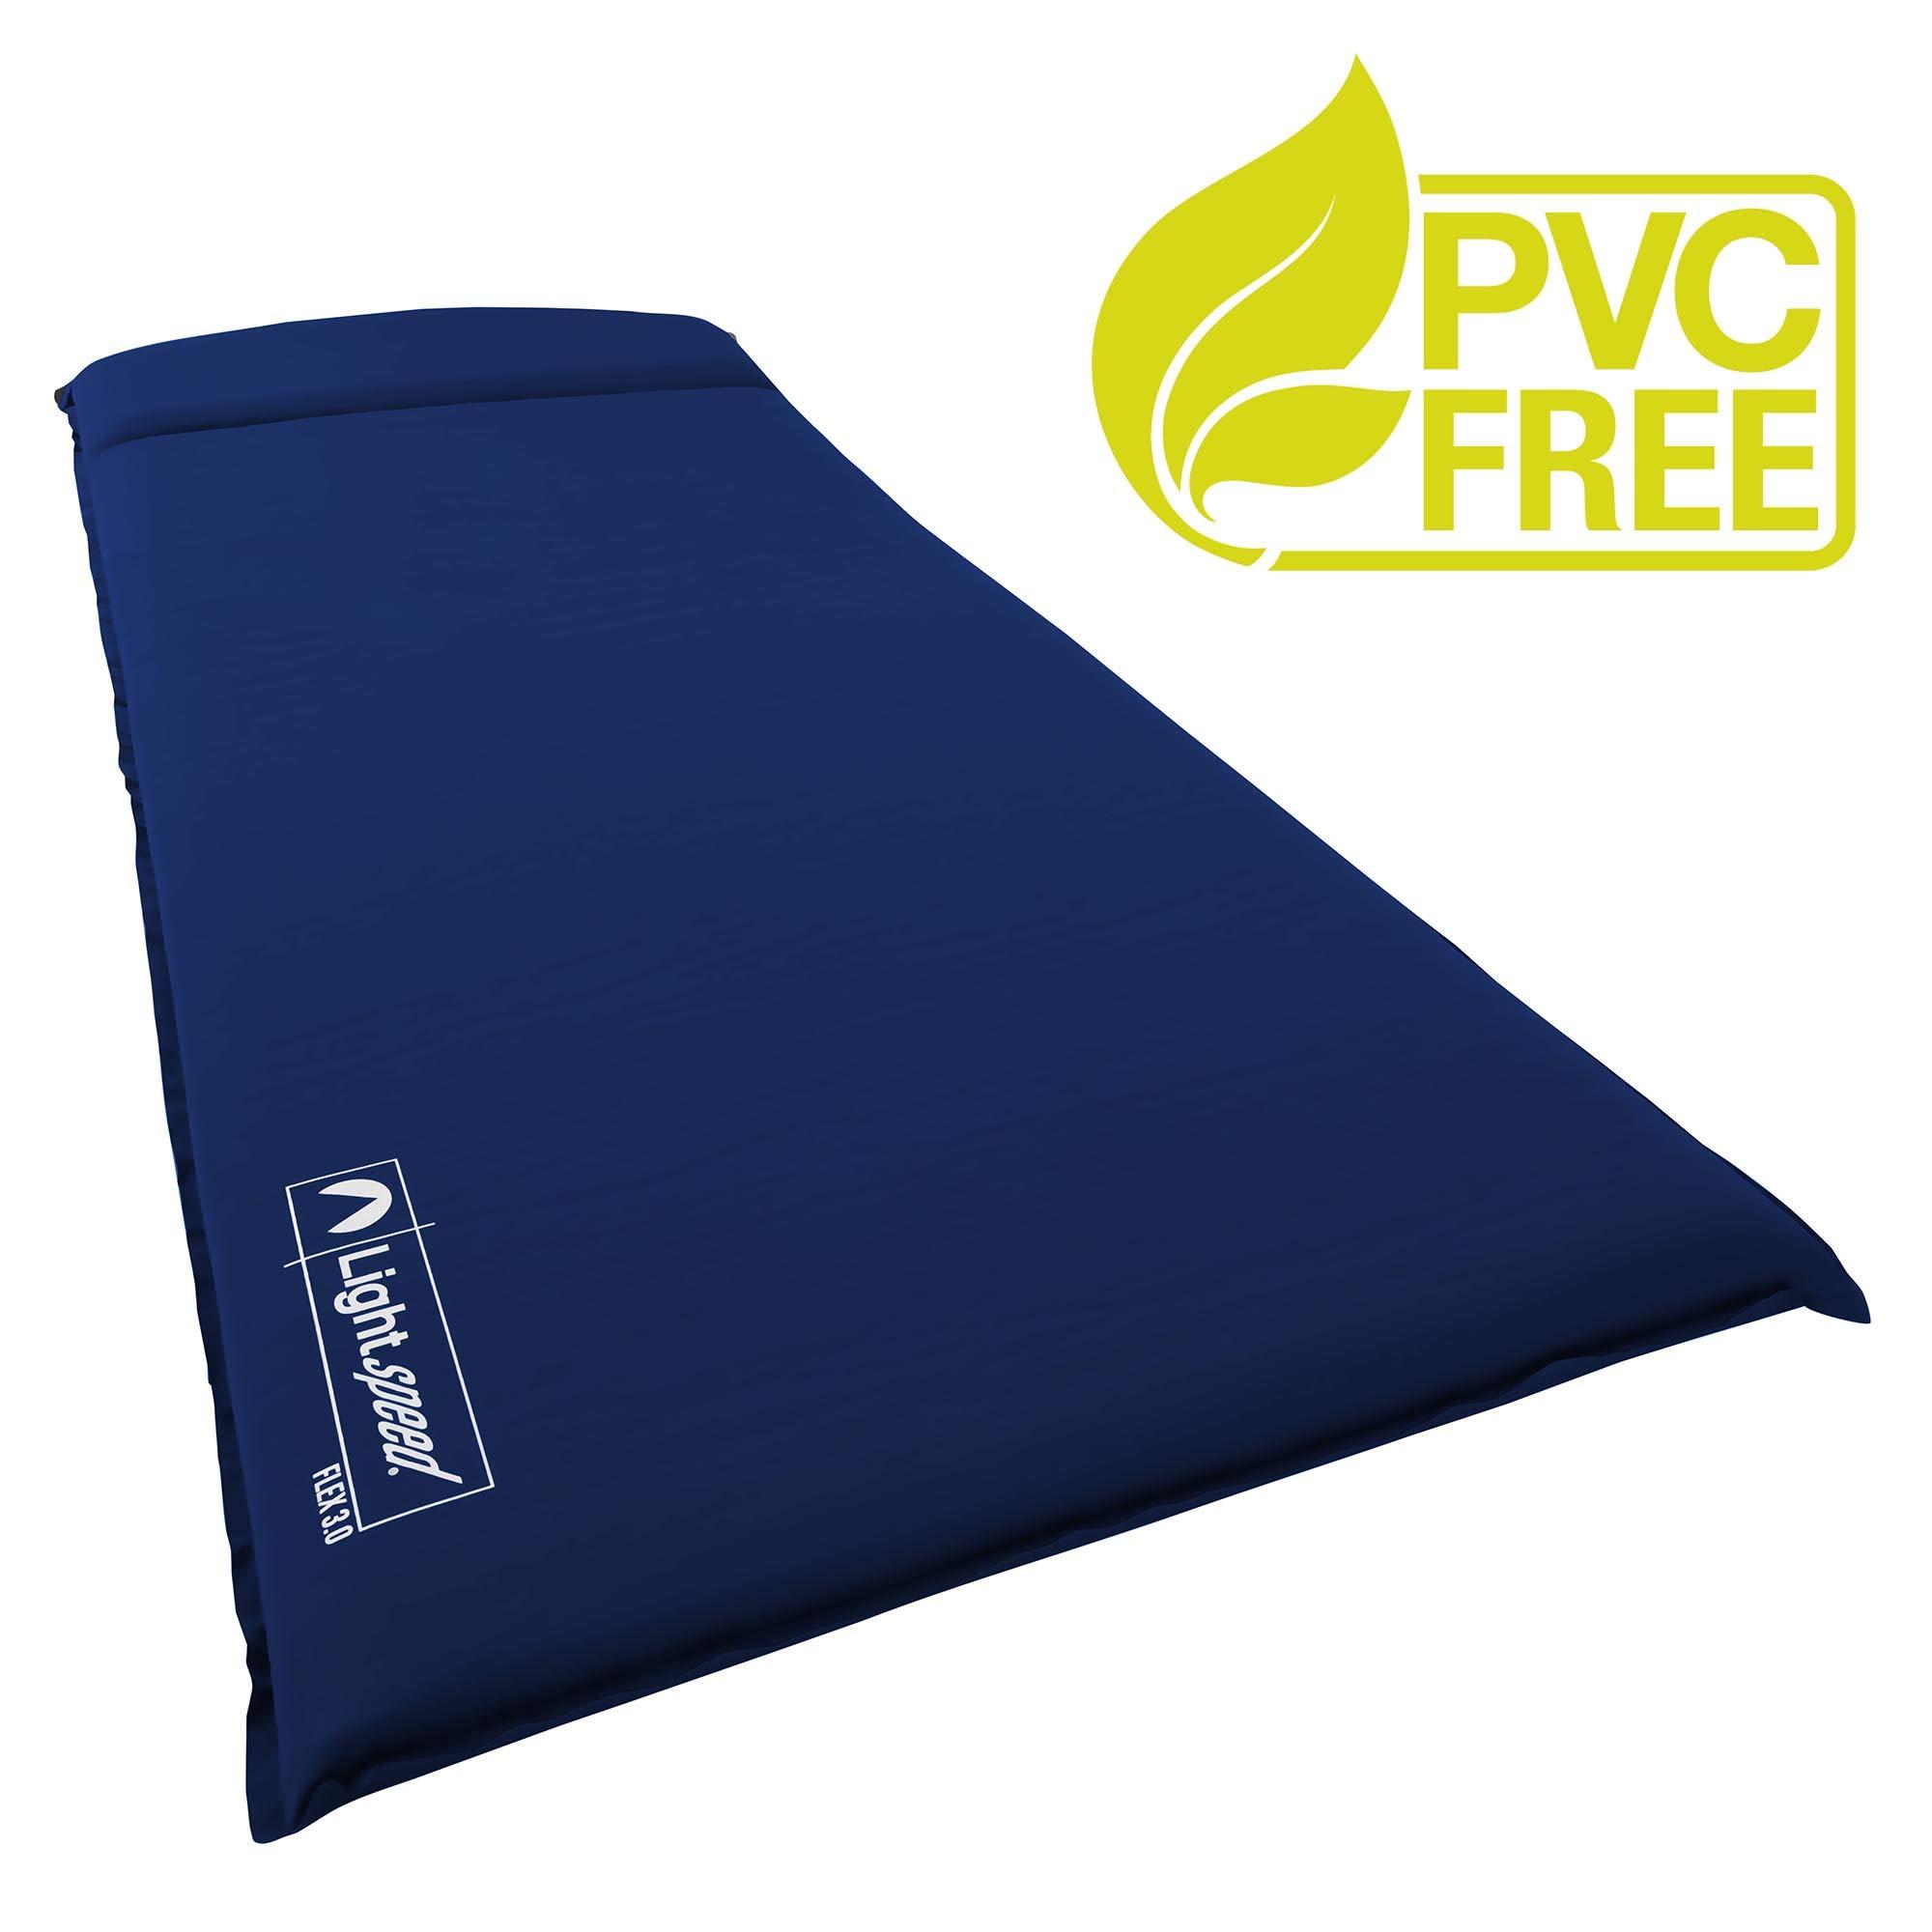 Lightspeed Outdoors XL Super Plush FlexForm Self-Inflating Sleep and Camp Pad, Dark Blue by Lightspeed Outdoors